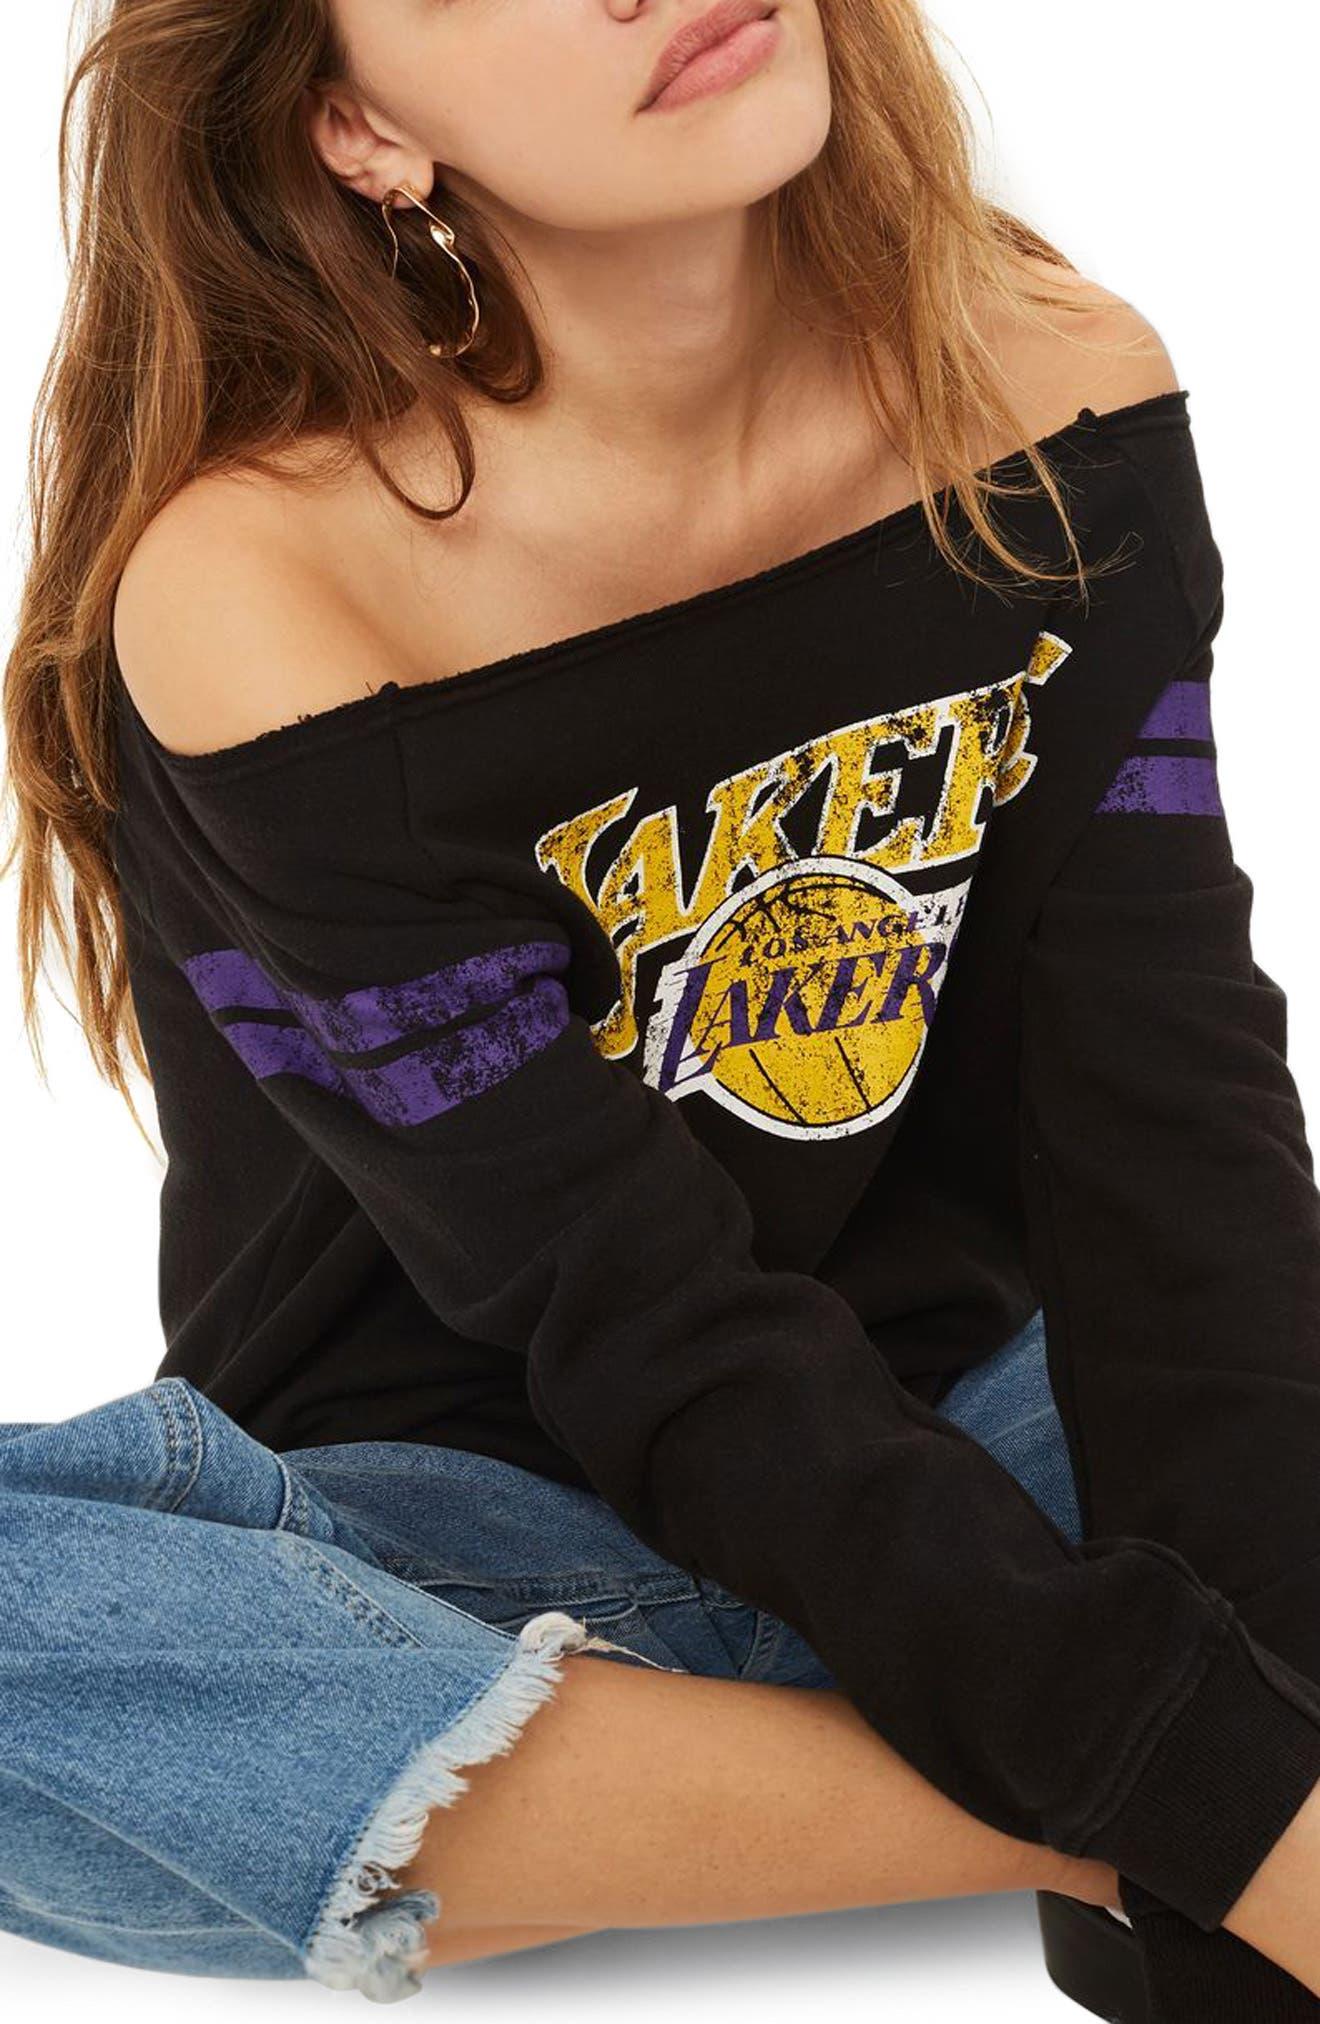 x UNK Lakers Convertible Sweatshirt,                         Main,                         color, Black Multi